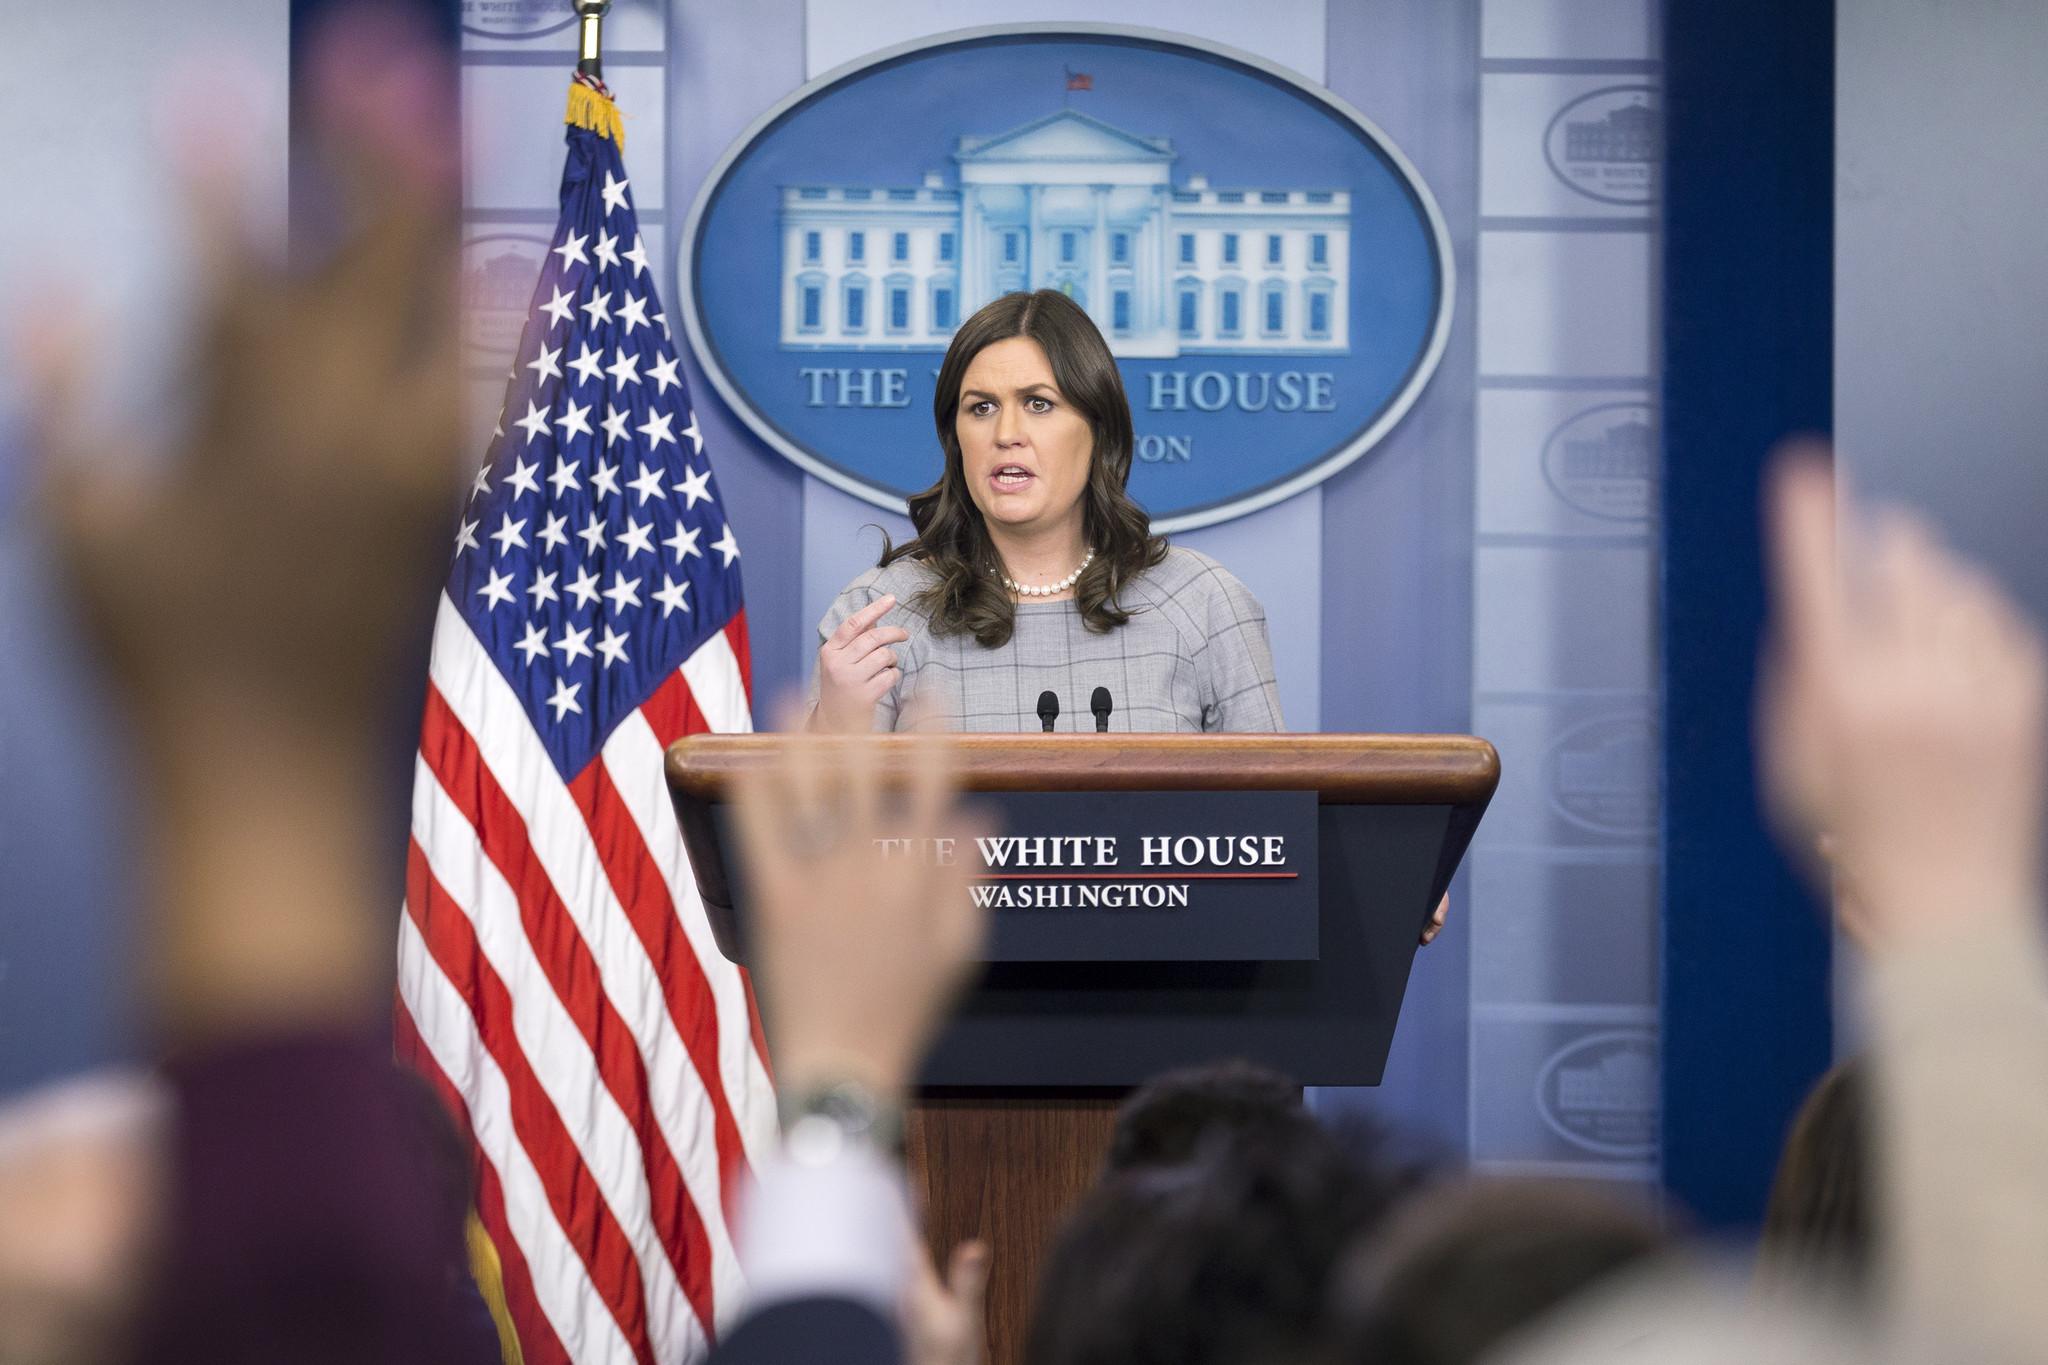 Trump anuncia saída de Sarah Sanders, porta-voz da Casa Branca